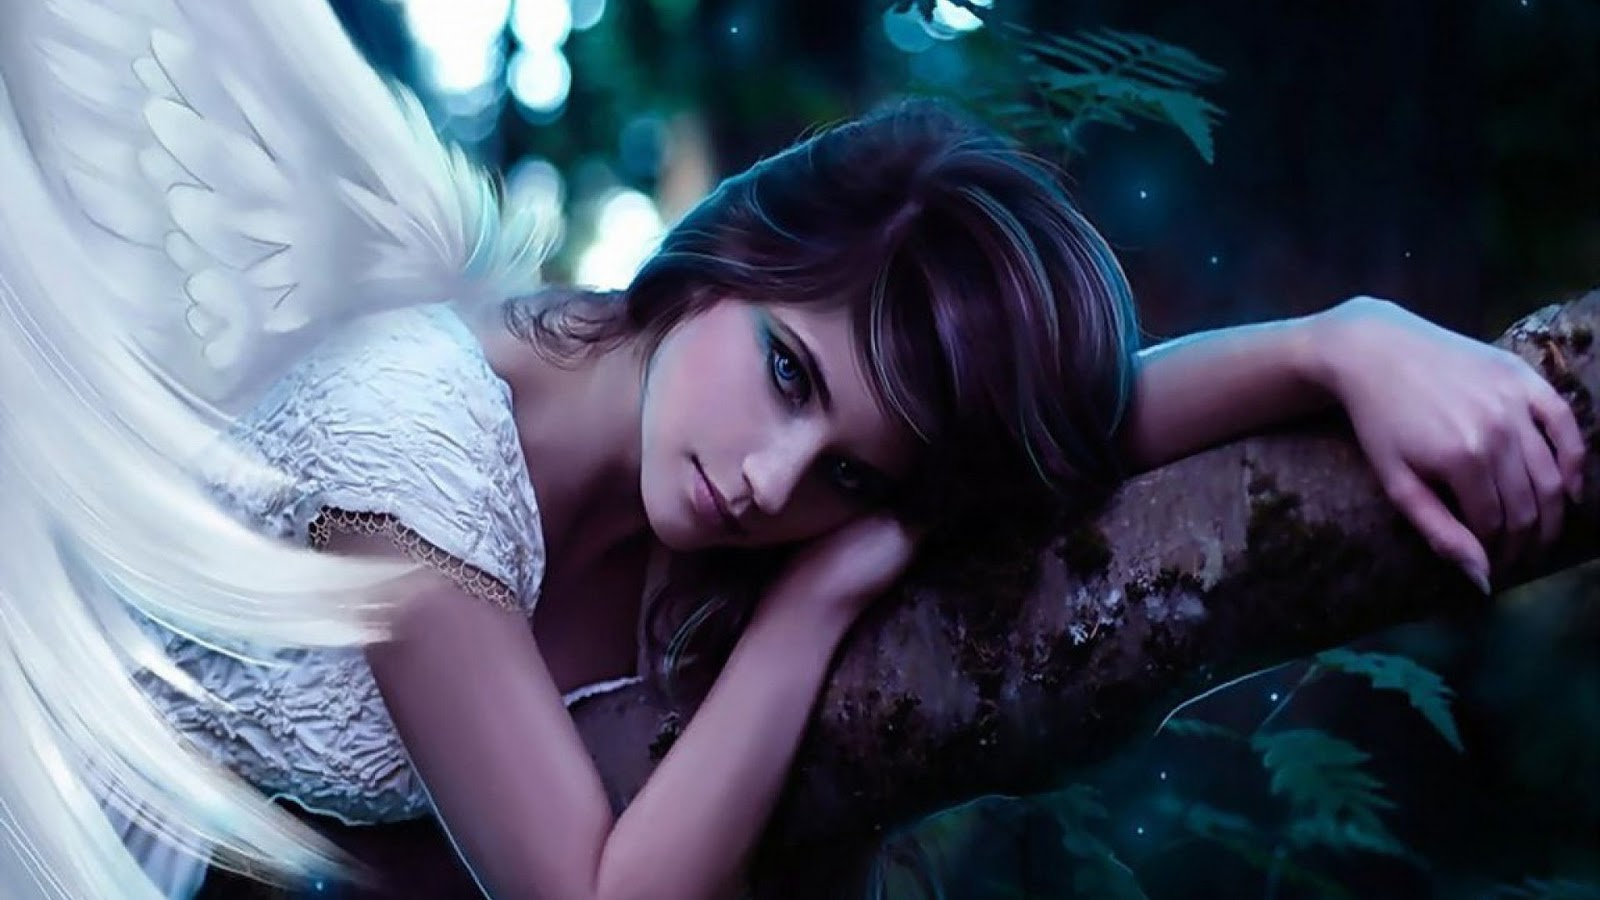 Best desktop hd wallpaper angel photo wallpapers - Angel girl wallpaper ...